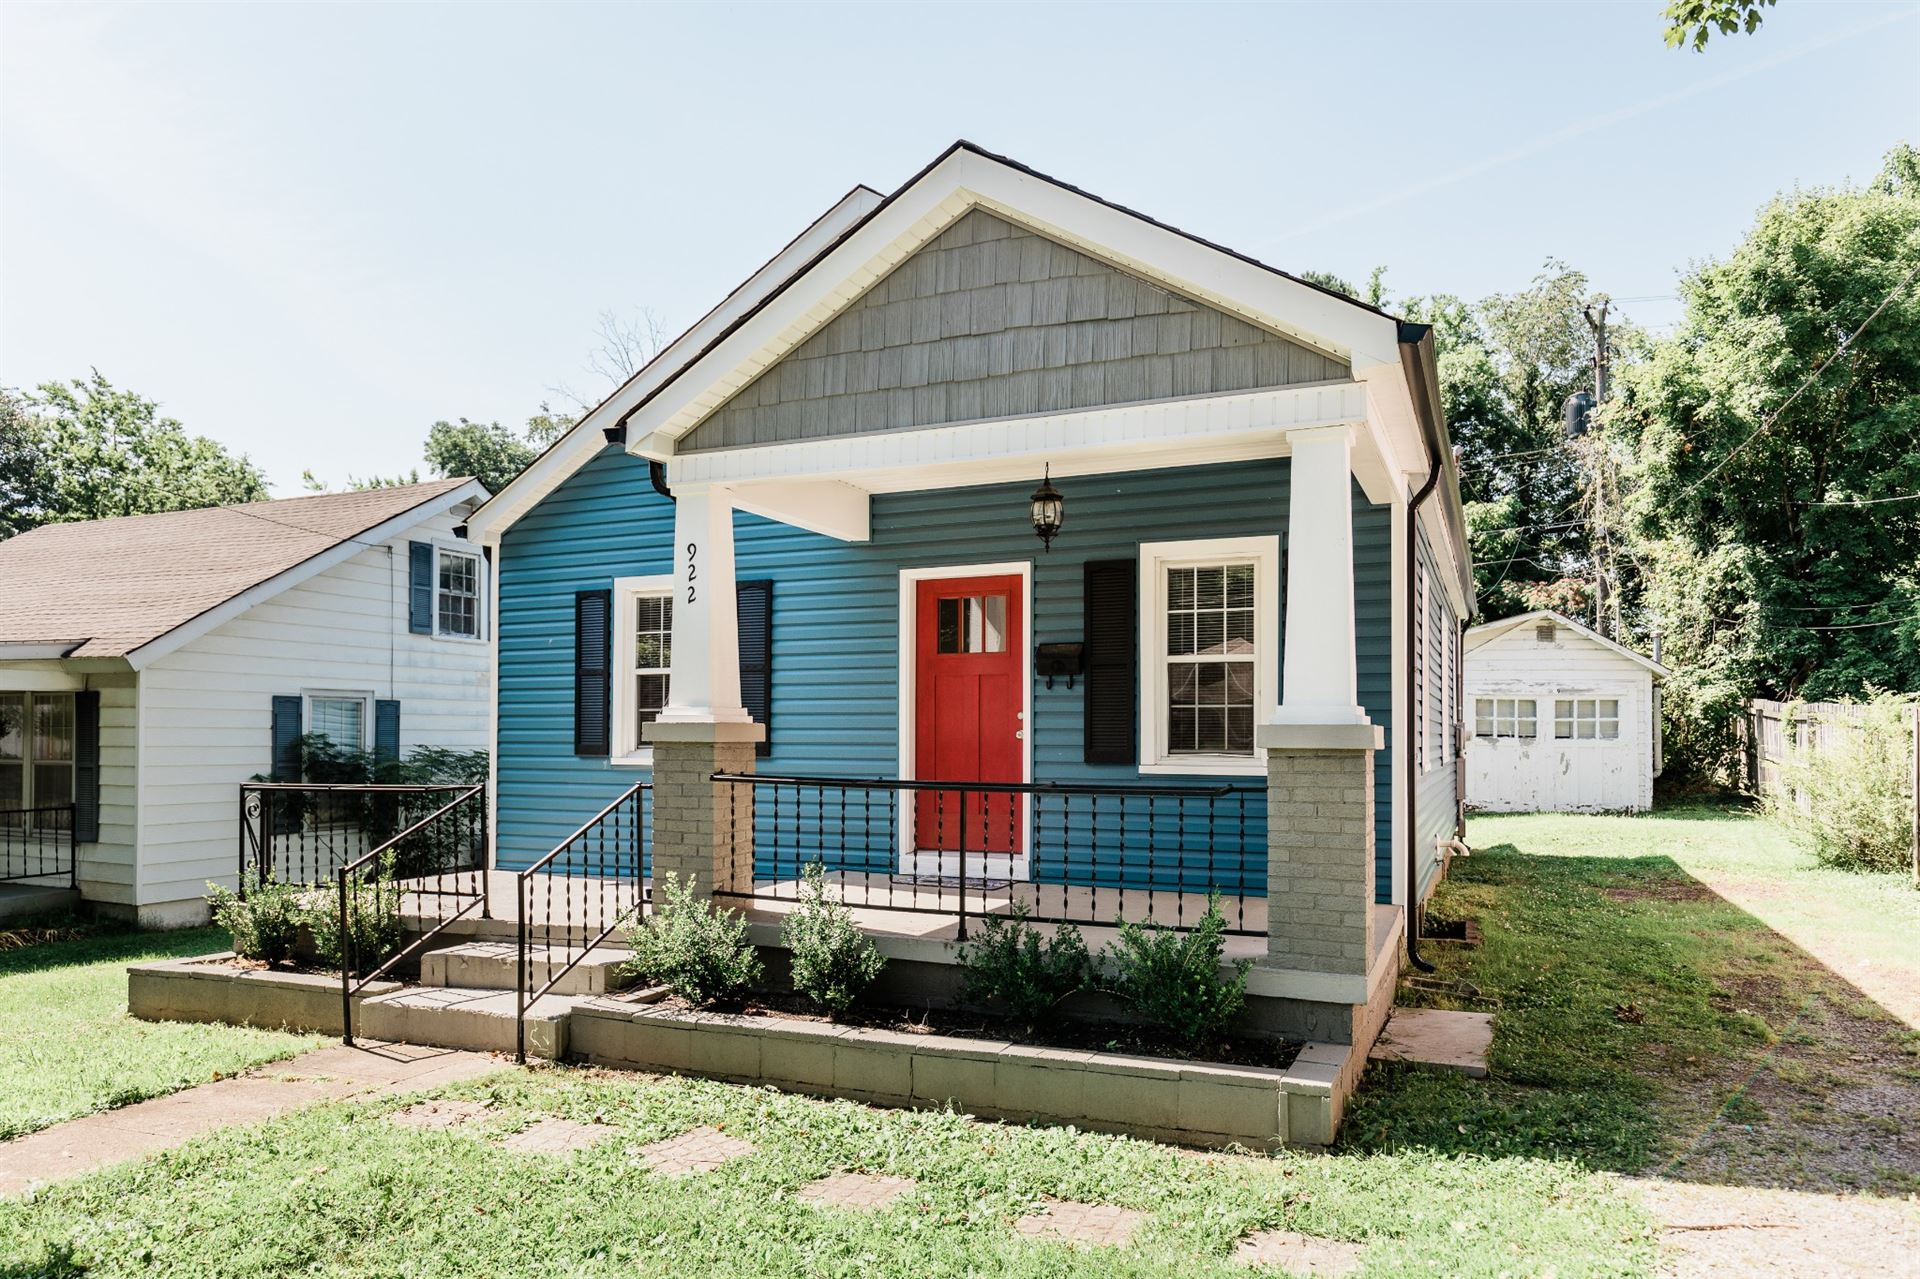 922 Crossland Ave, Clarksville, TN 37040 - MLS#: 2264134